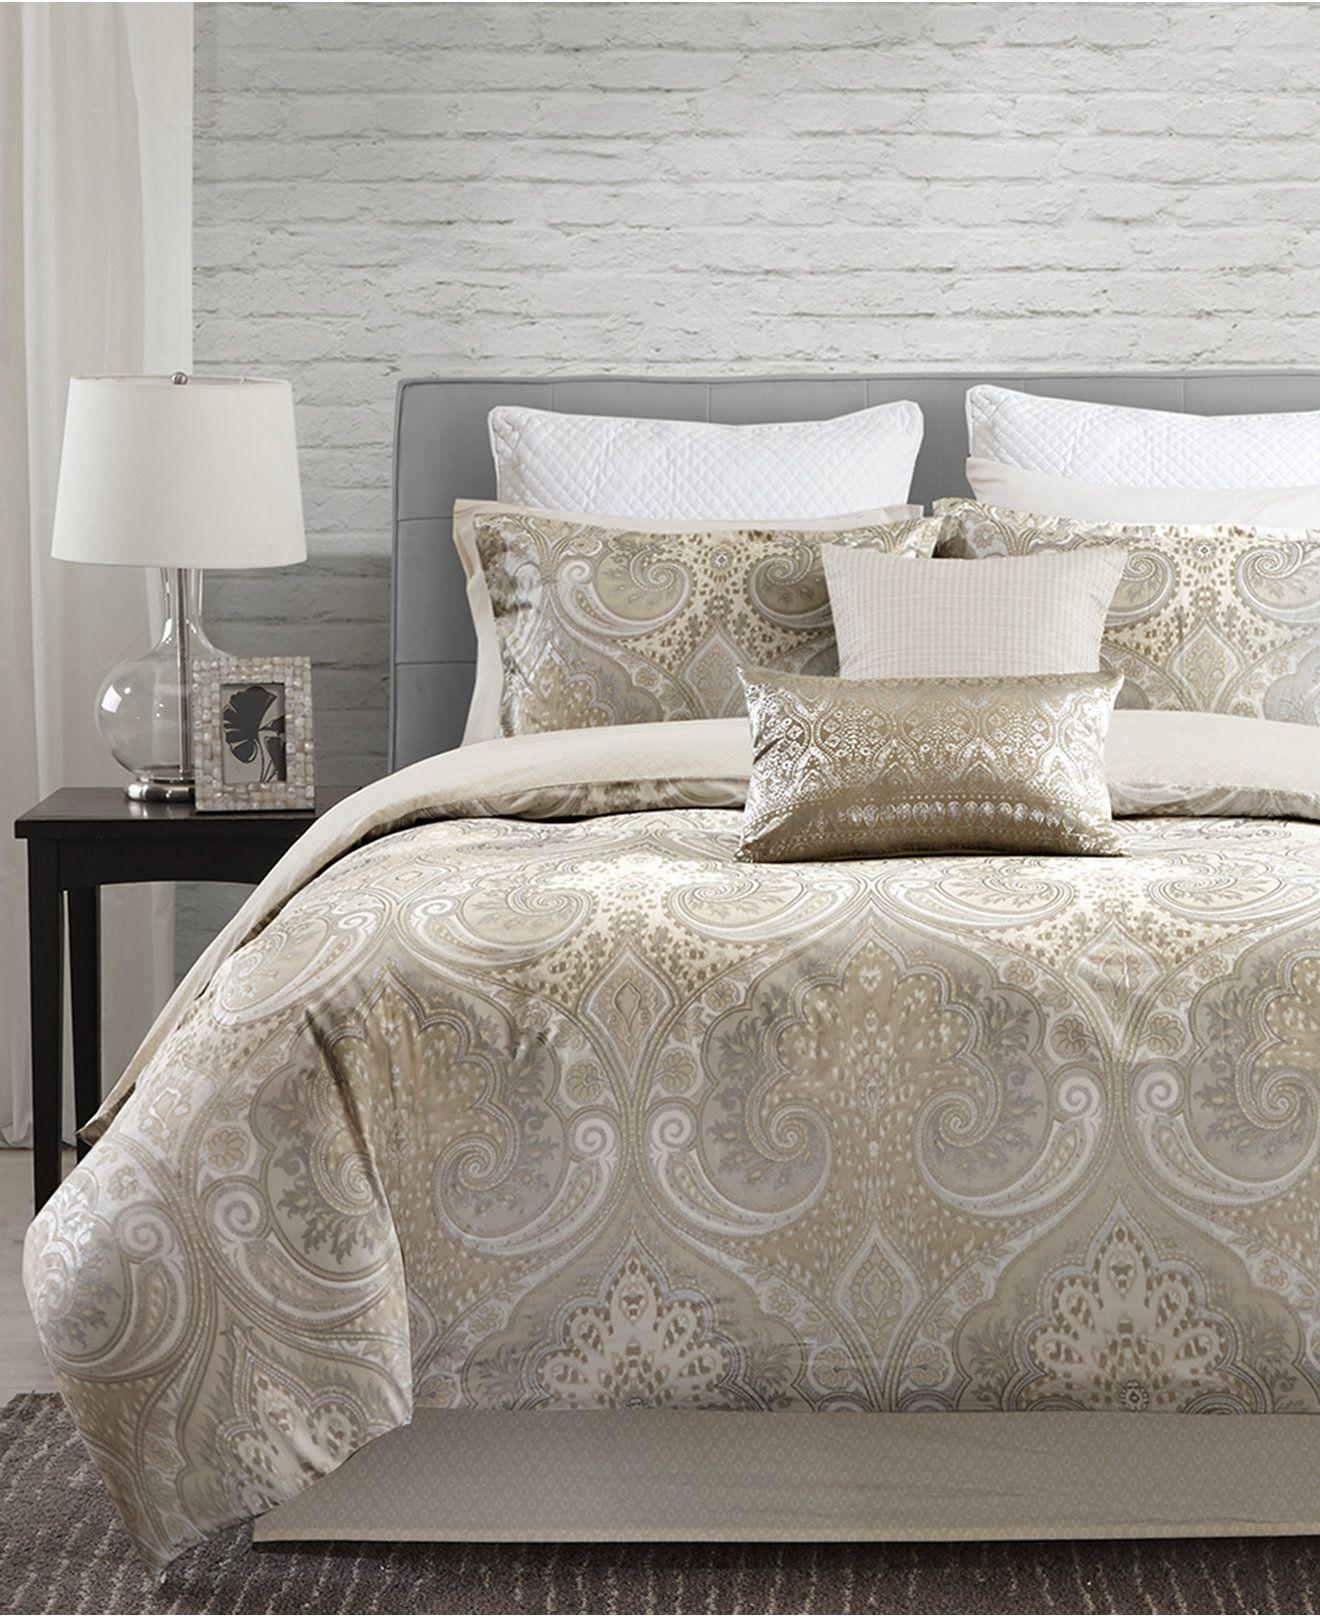 Echo Juneau Comforter and Duvet Sets Duvet Covers Bed